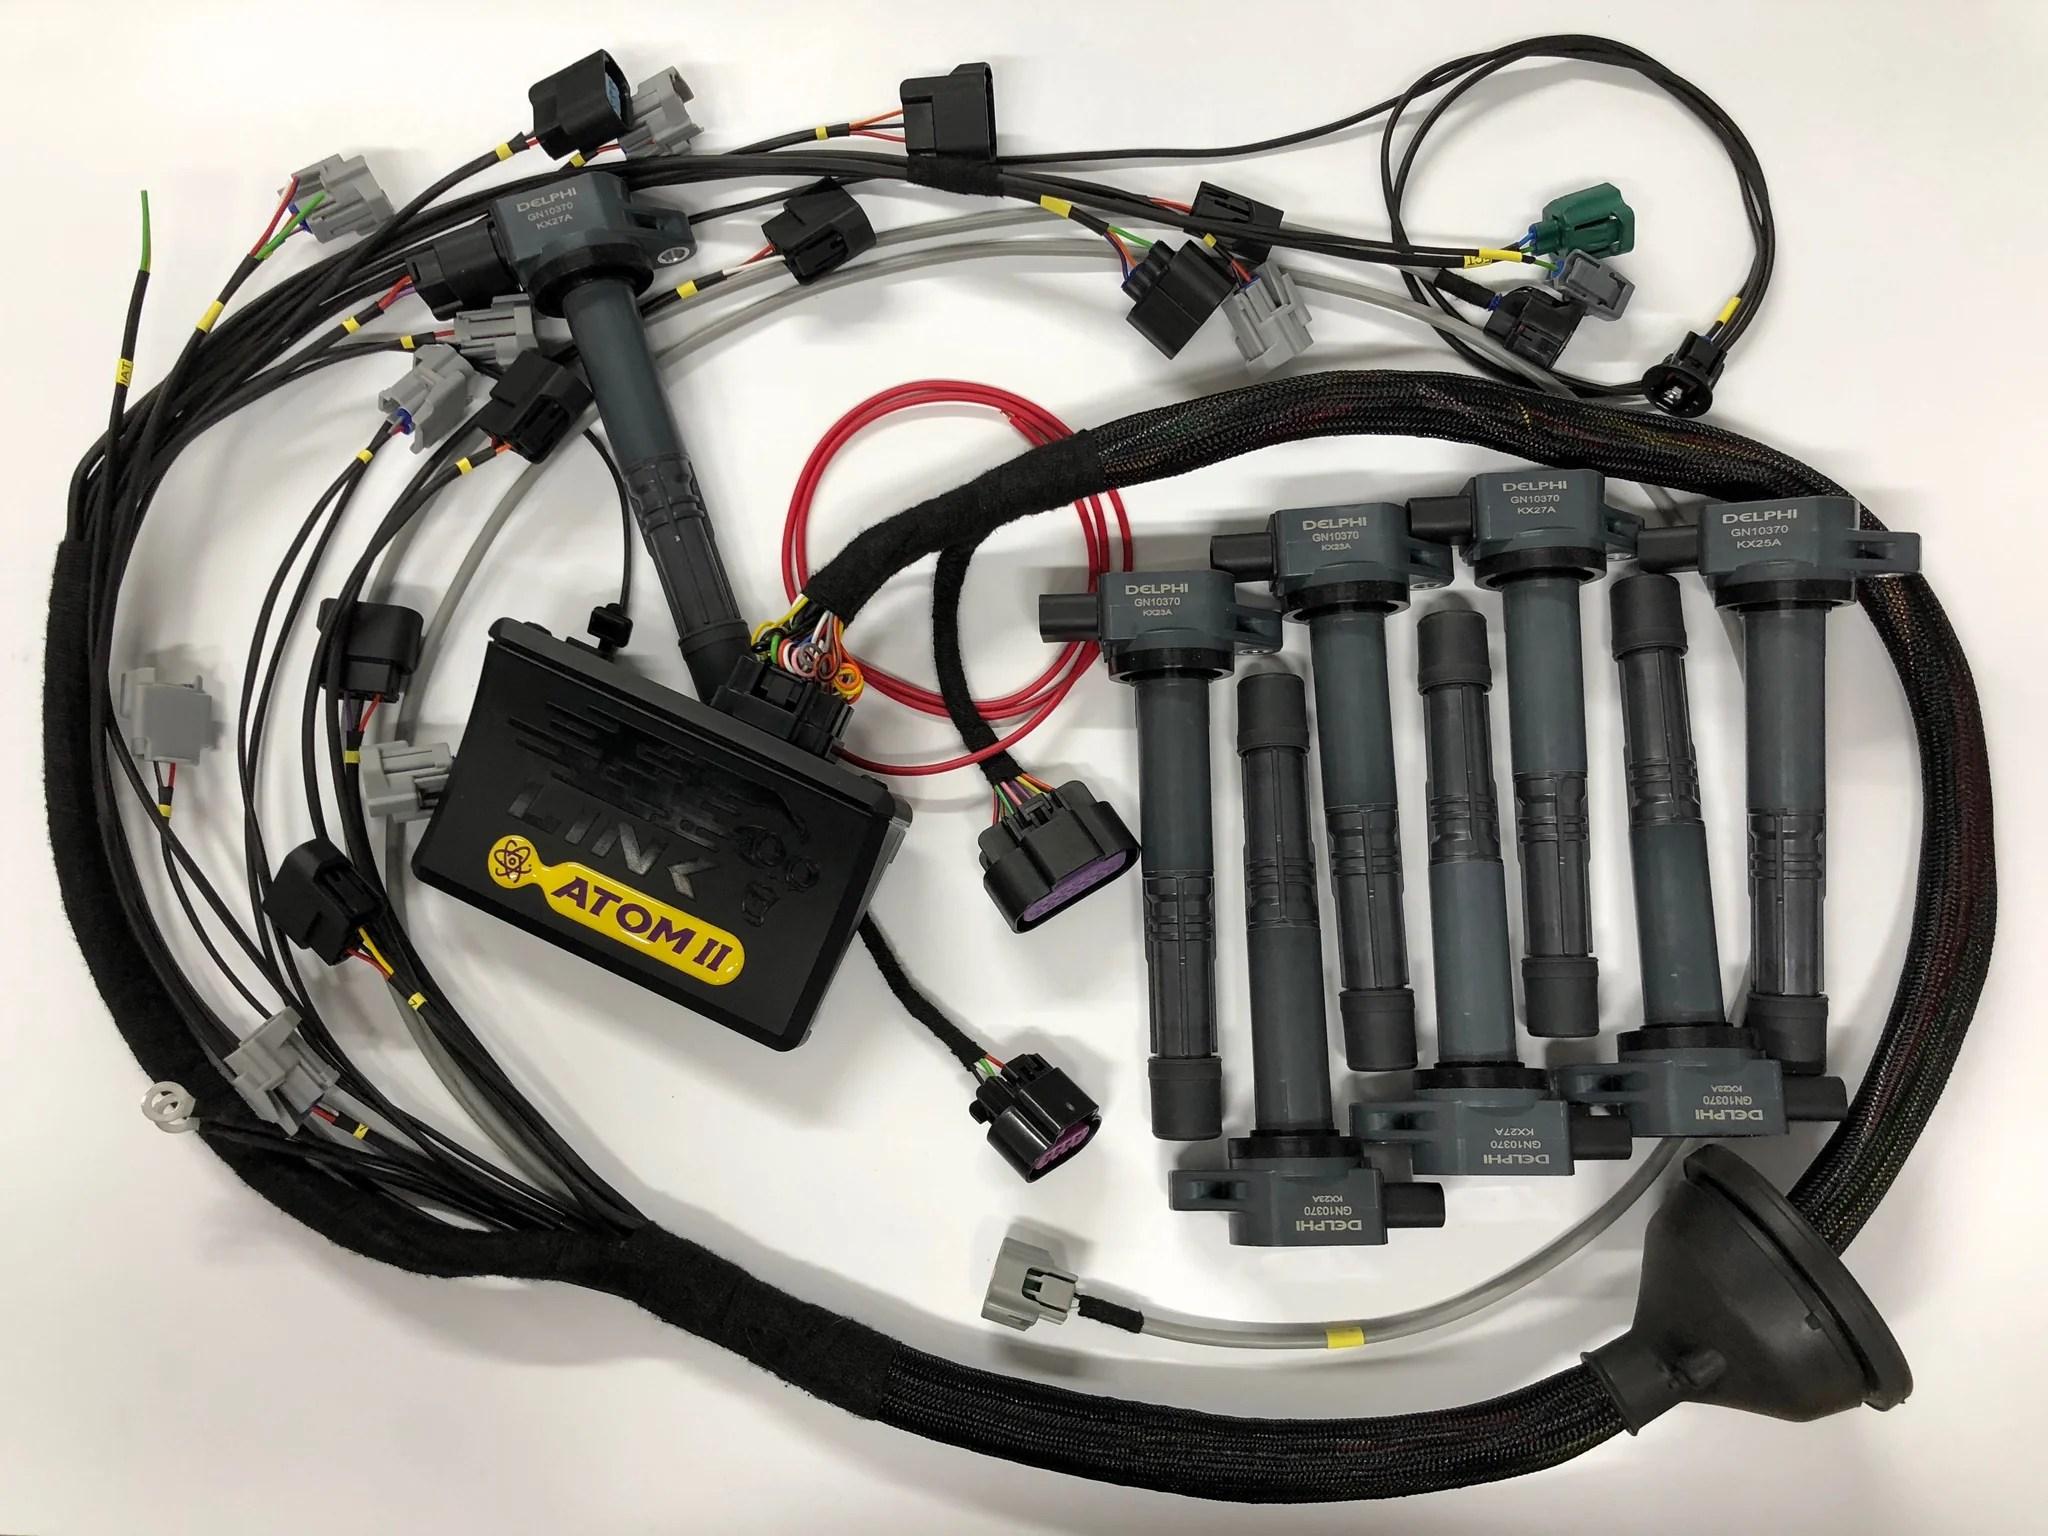 medium resolution of link g4 atom storm xtreme thunder ecu 1uzfe 1uz with wiring loo brands hatch performance ltd